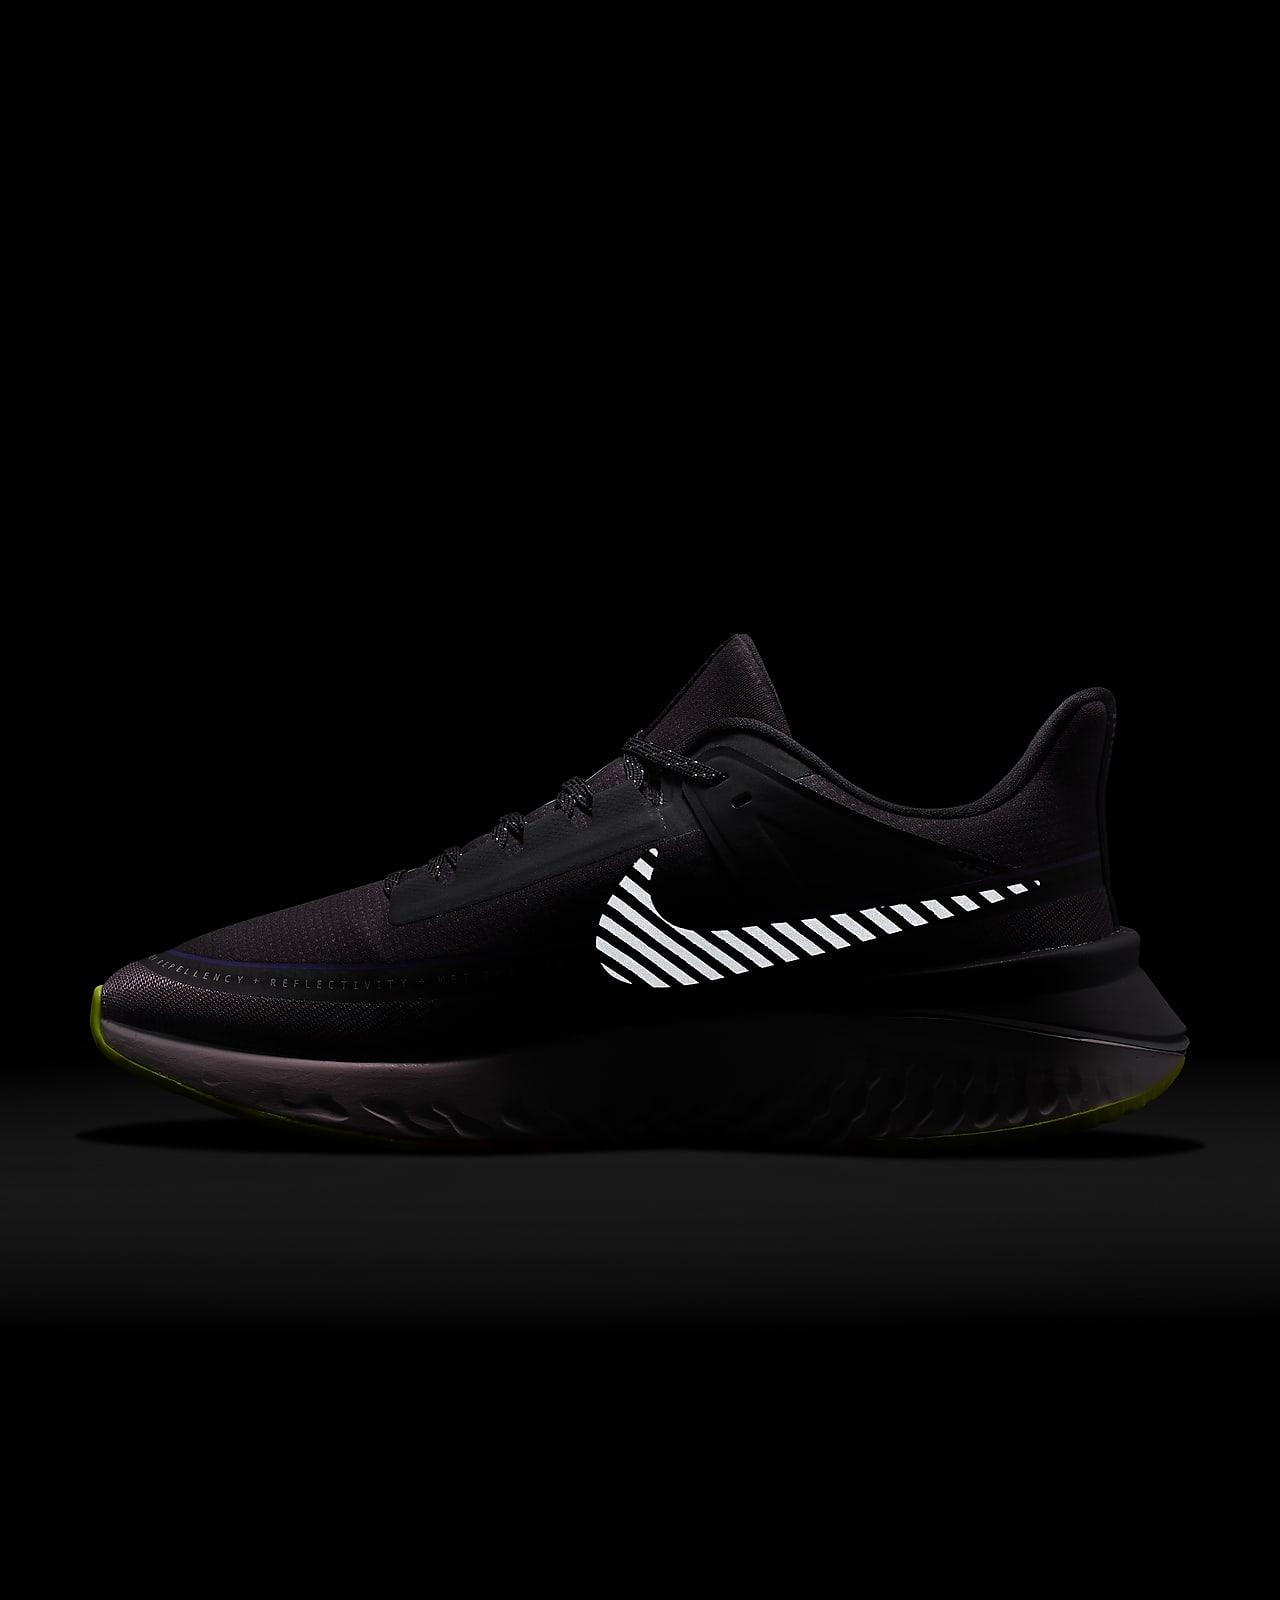 Chaussure de running Nike Legend React 2 Shield pour Homme